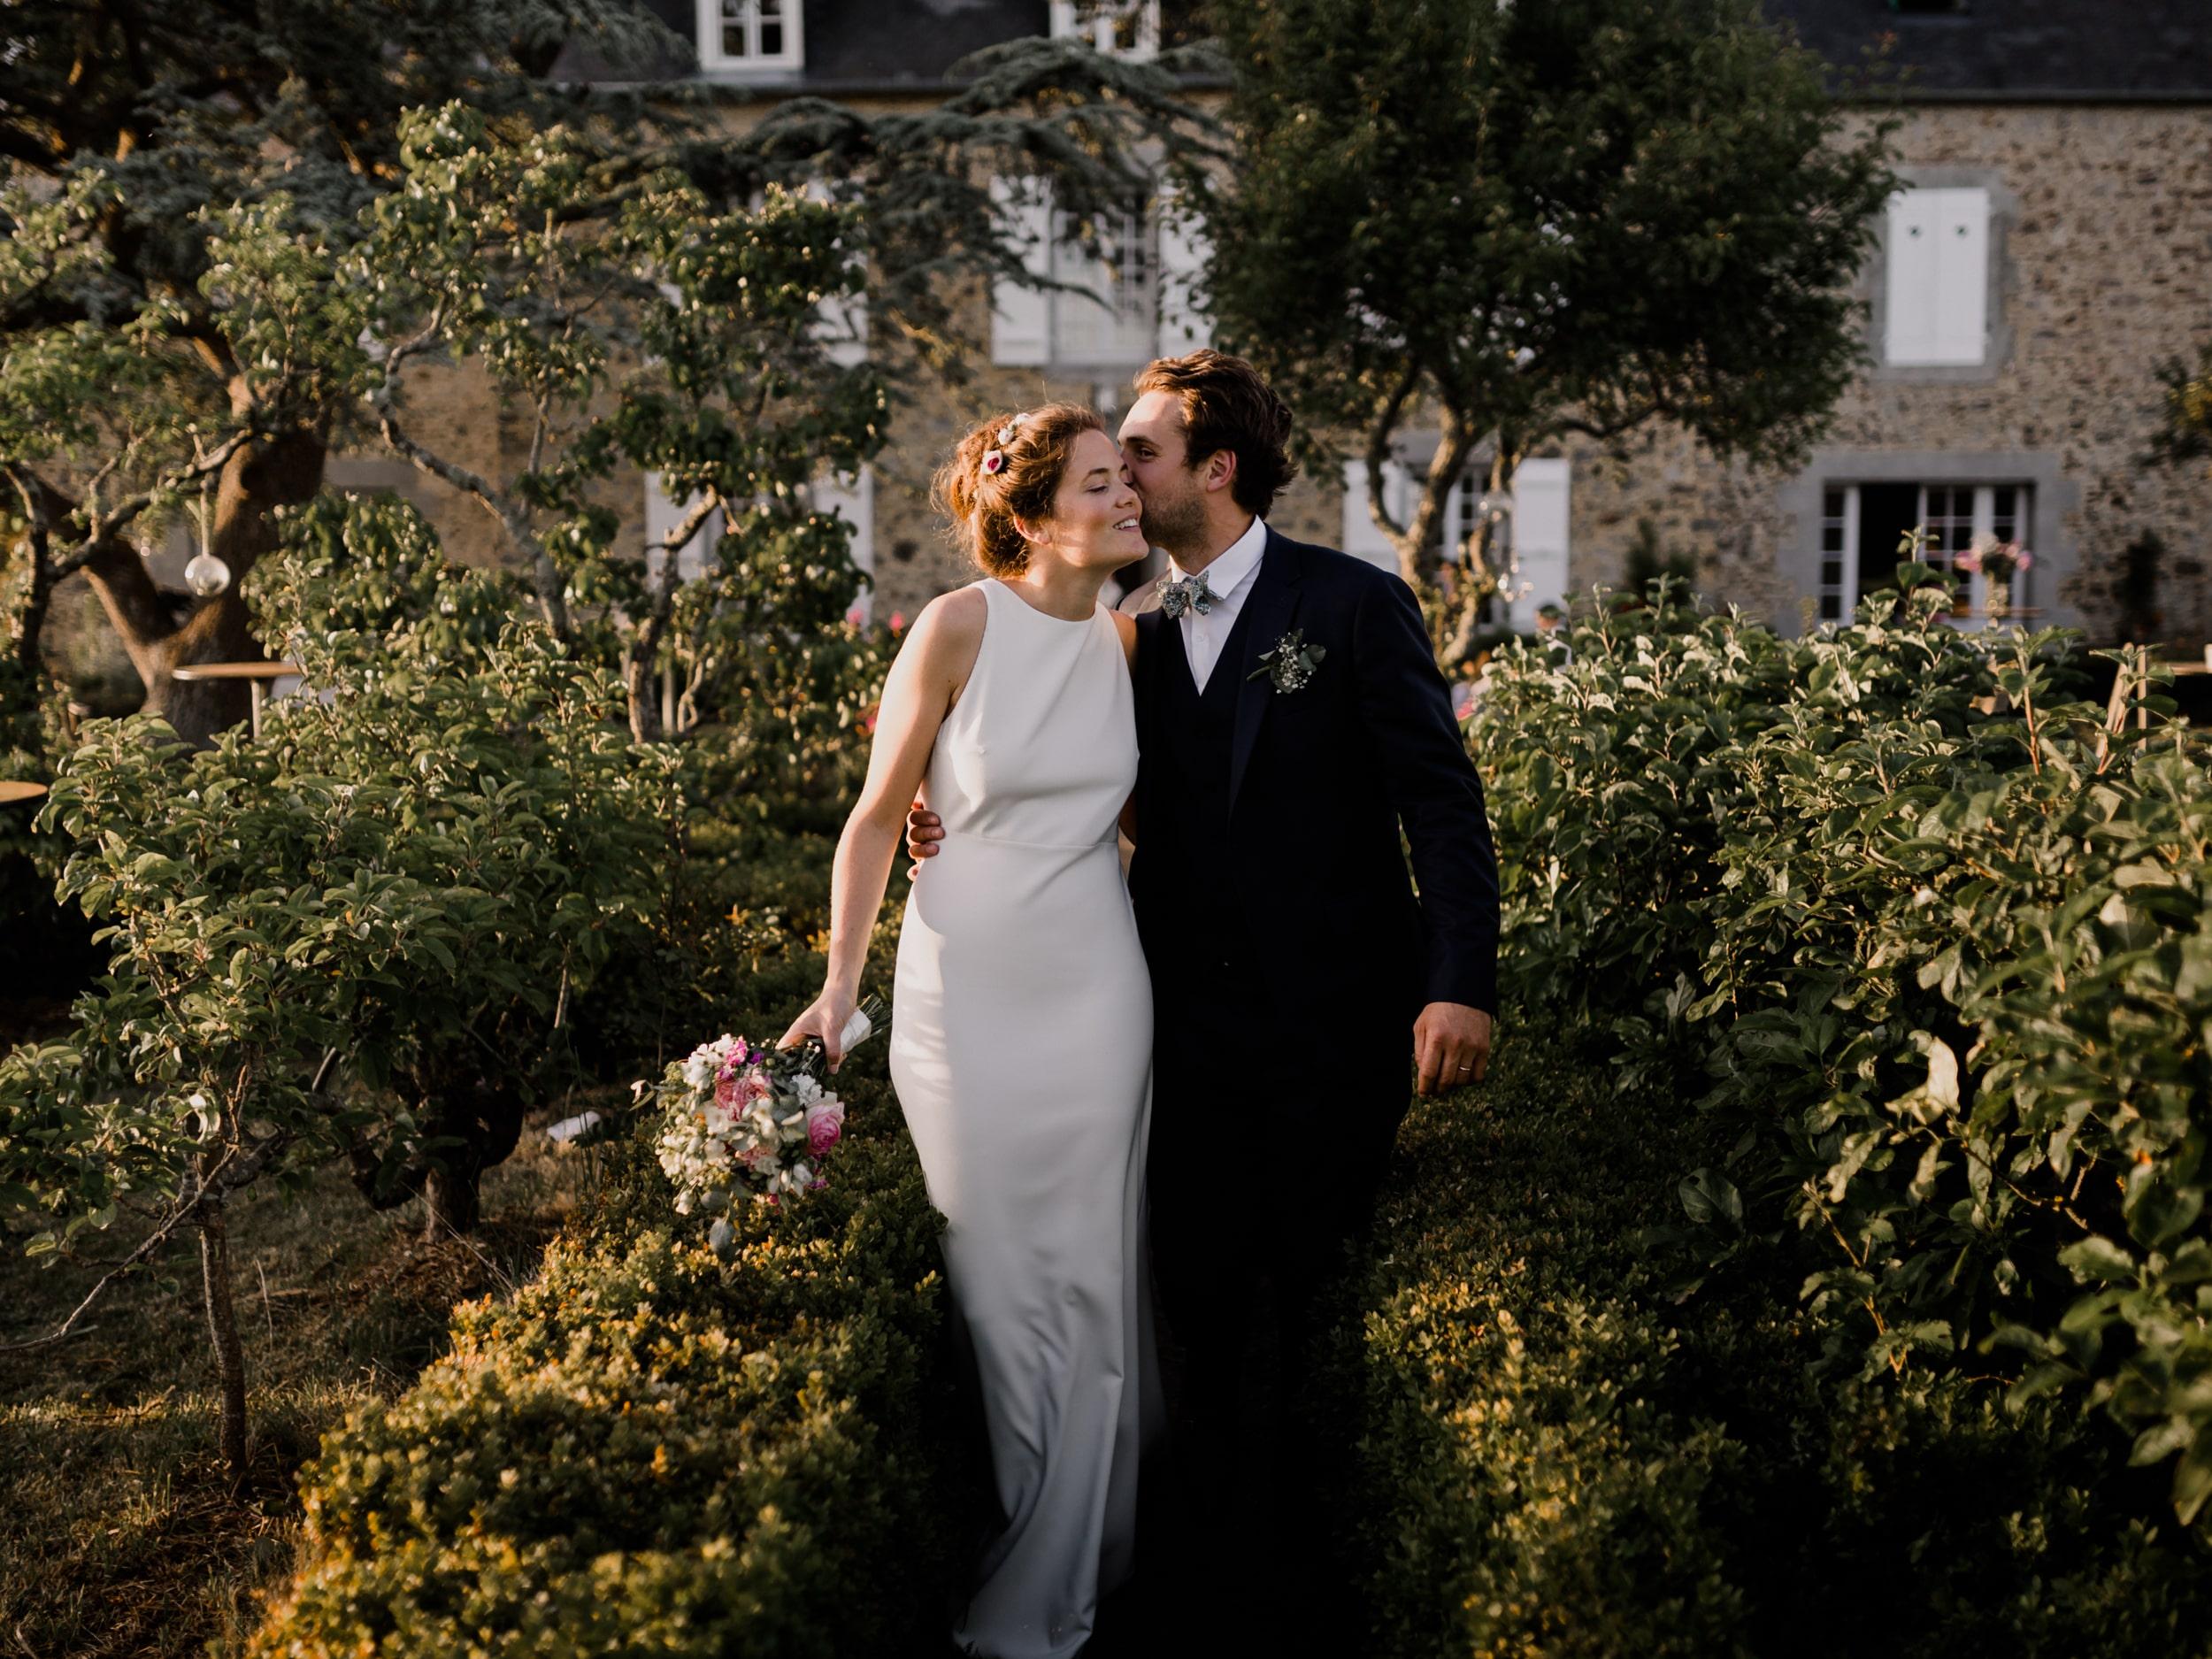 photographe-mariage-normandie-simon-davodet-6